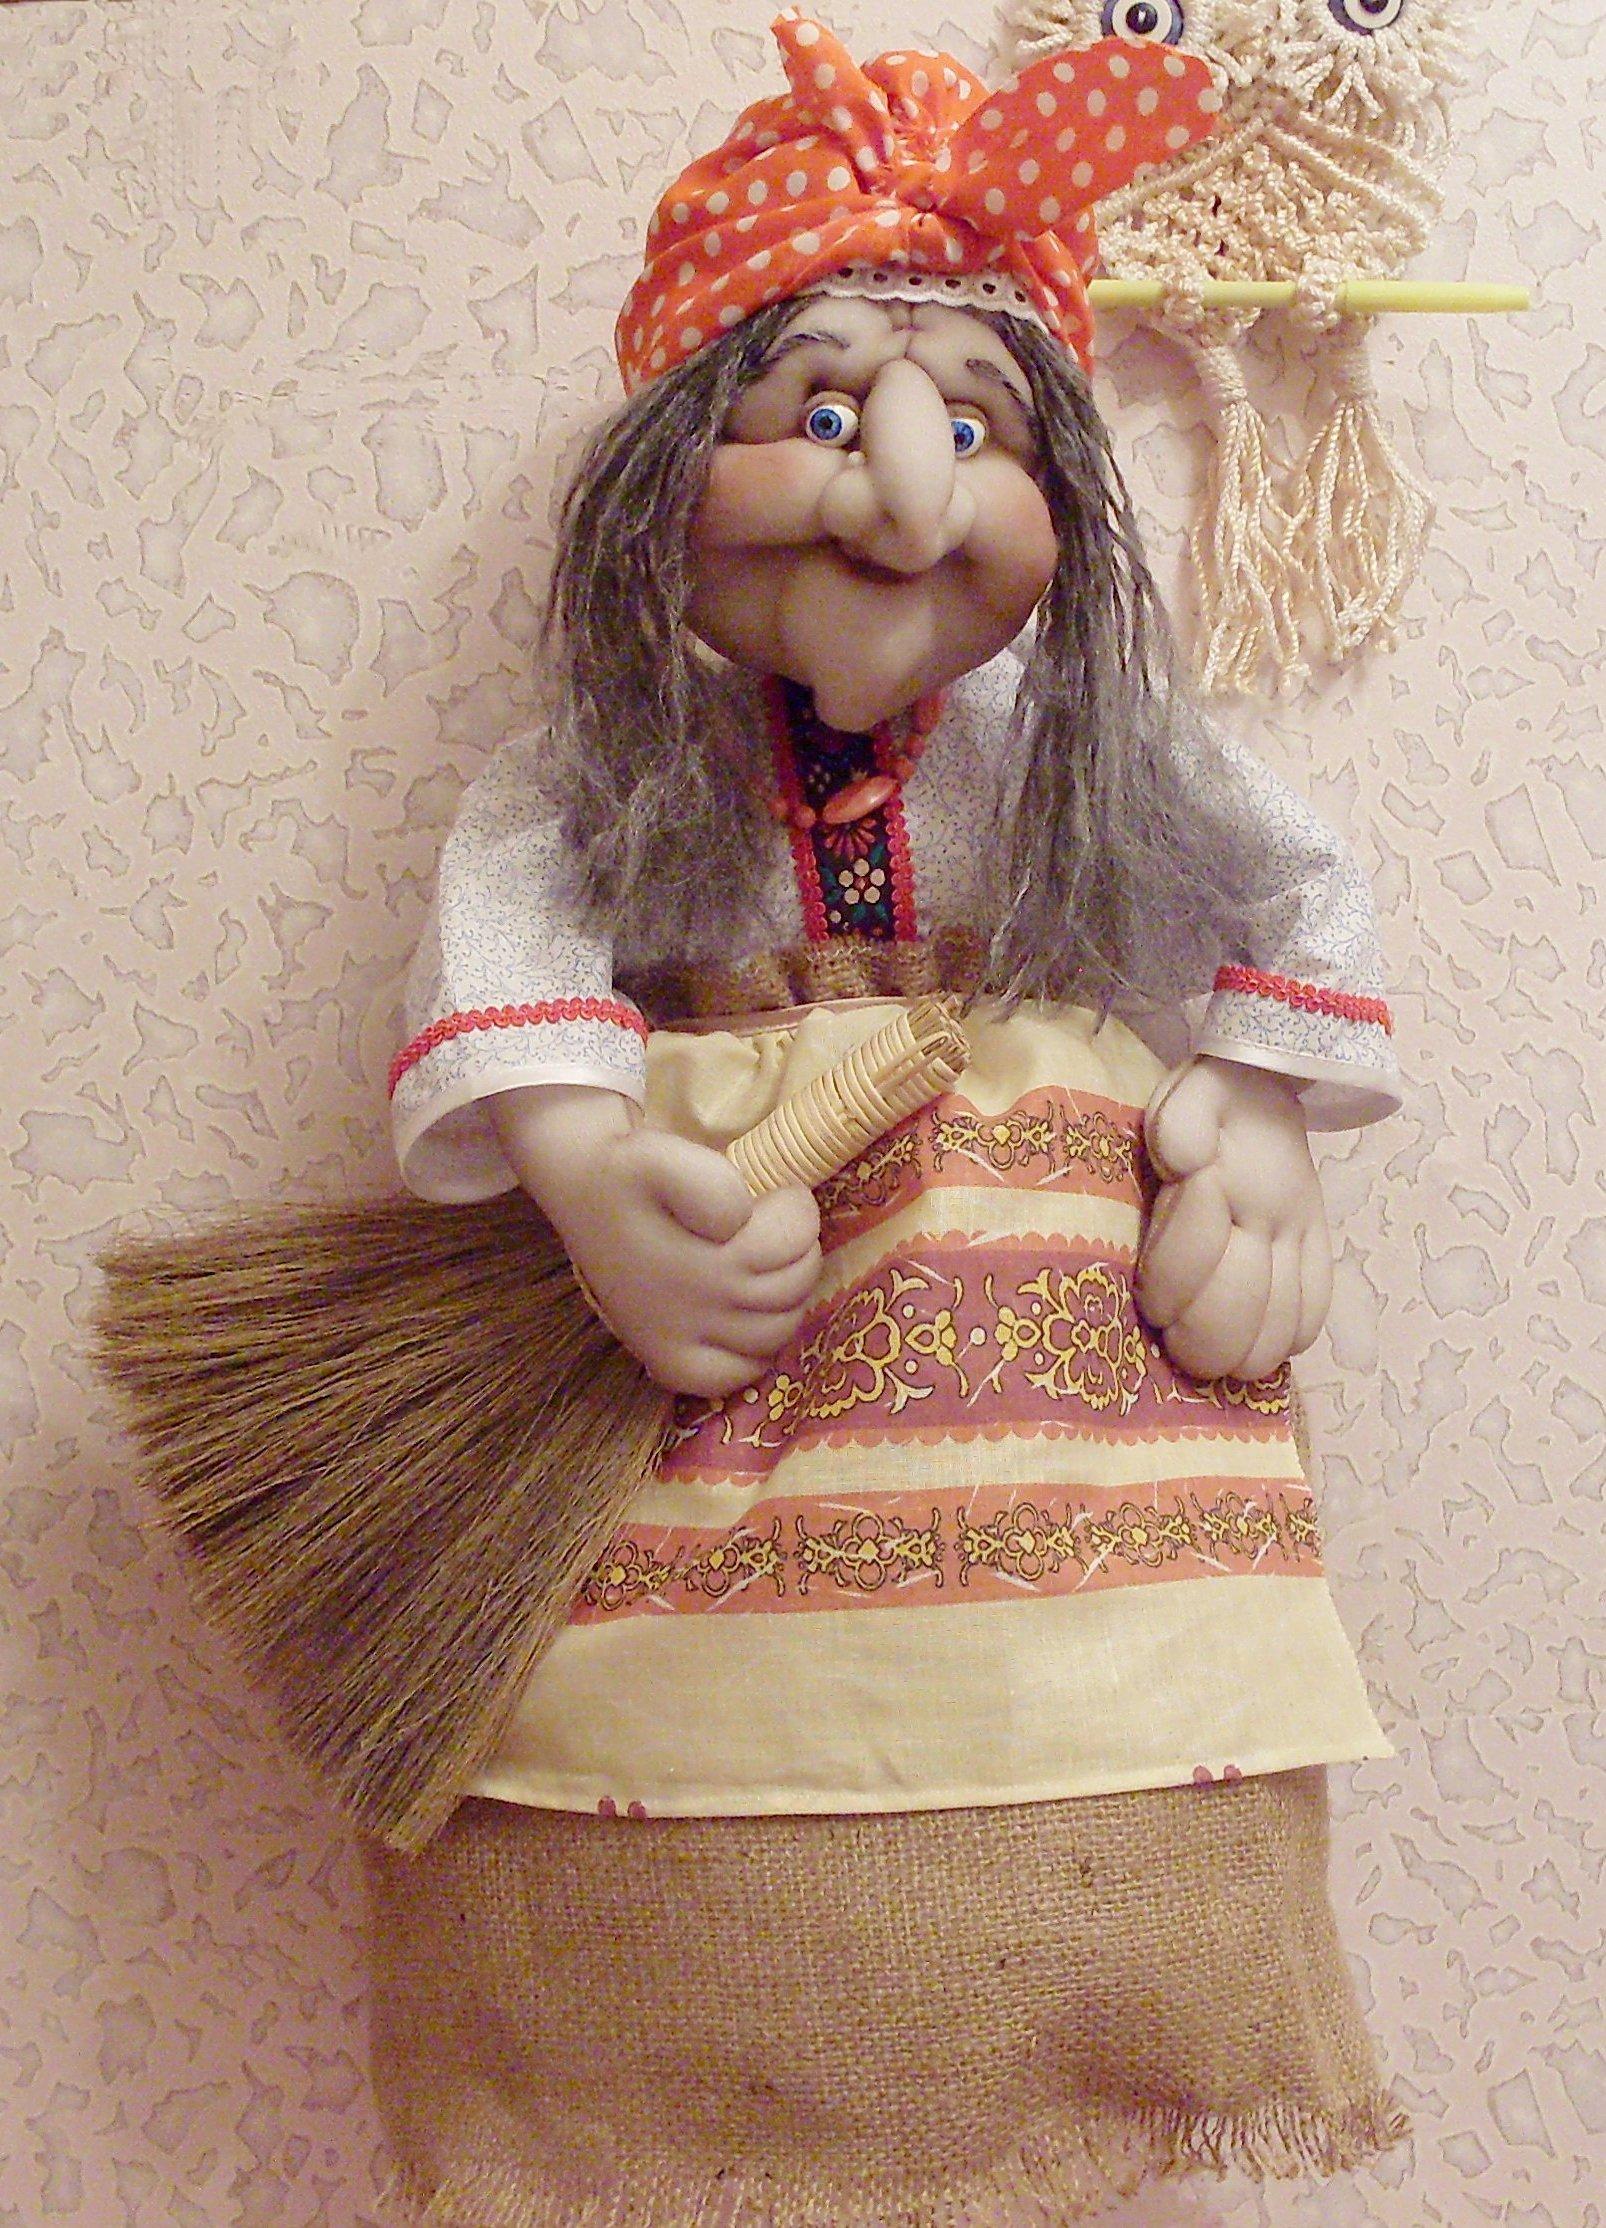 kukly_iz_kolgotok_master_klass.jpg.crop_display Куклы из колготок - мастер-класс